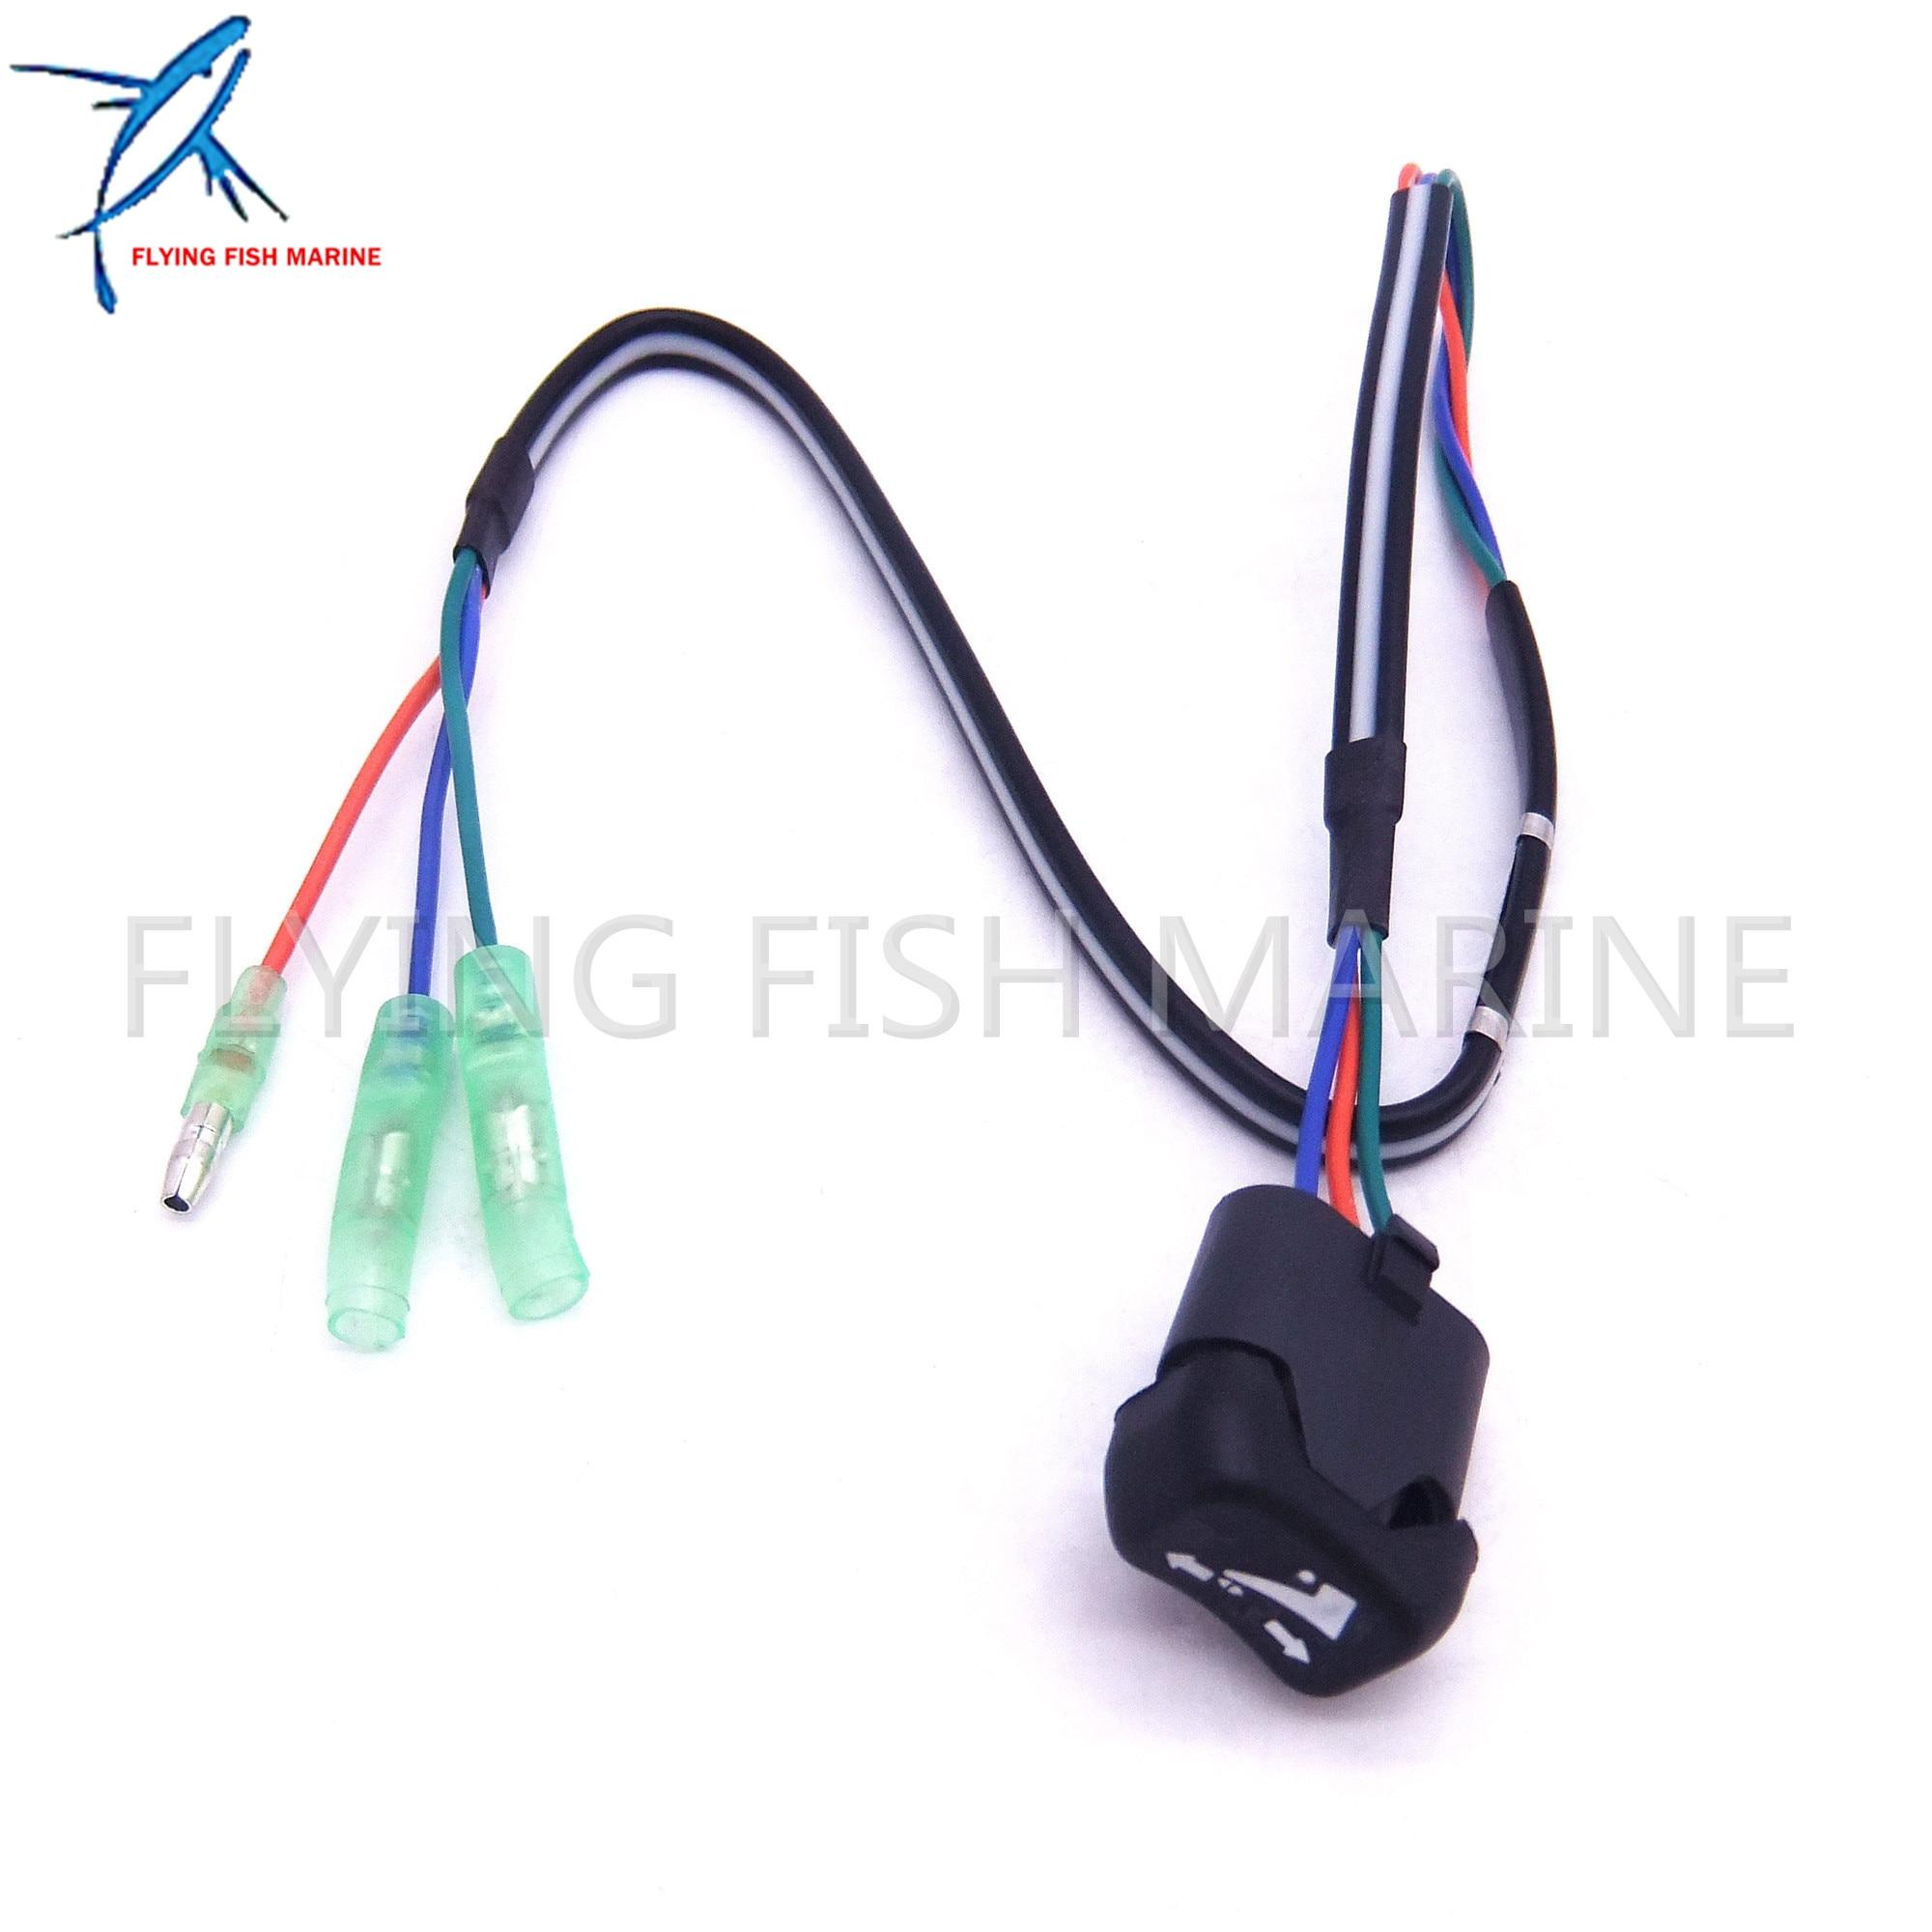 87 18286A43 18286A43 Trim Tilt Switch For Mercury Outboard Remote Control Box